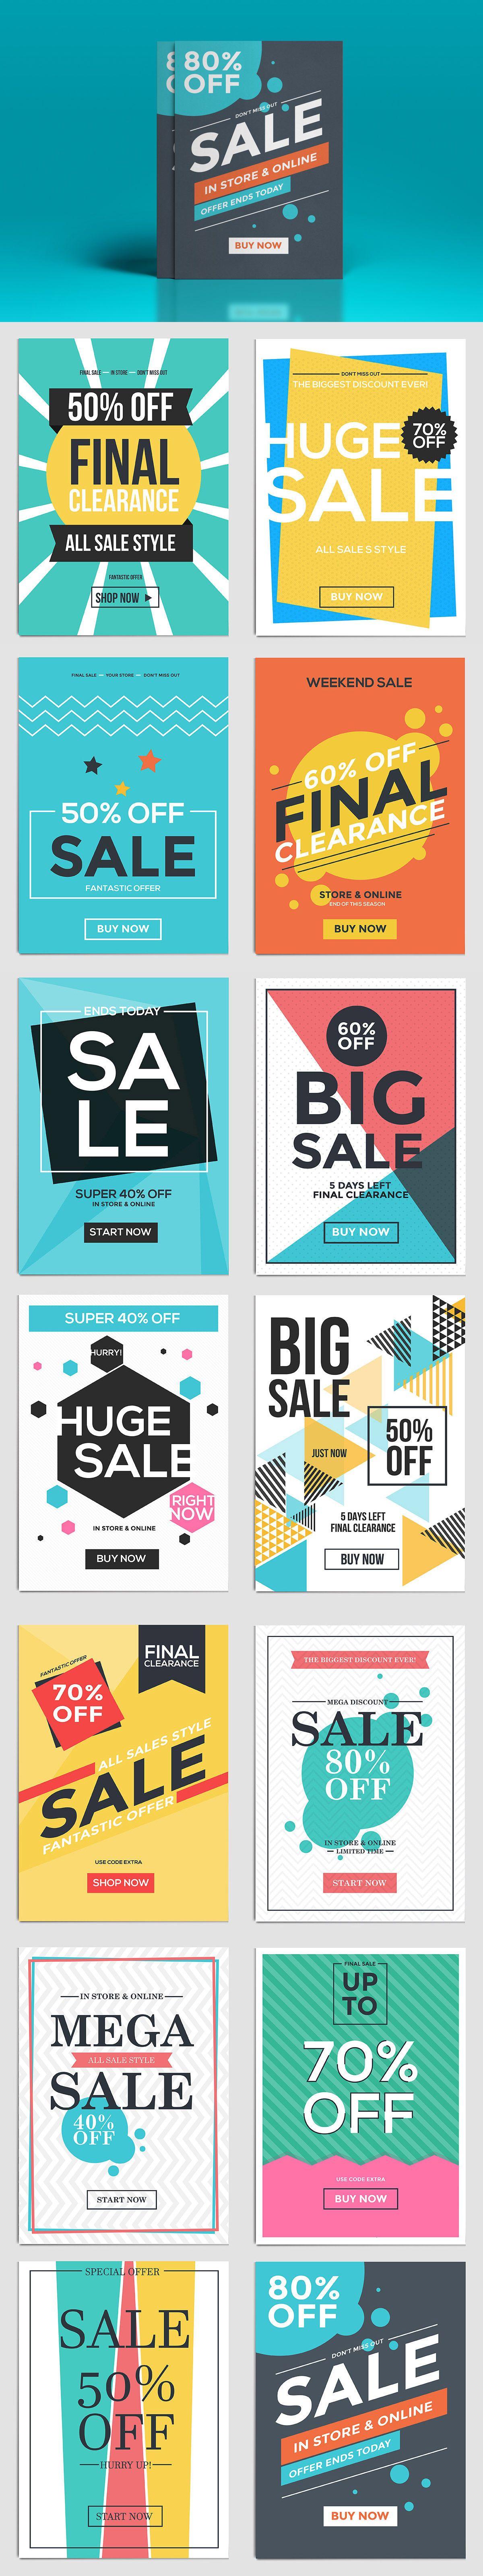 Flat Design Sale Flyer Template Vector Ai Eps Ads Pinterest